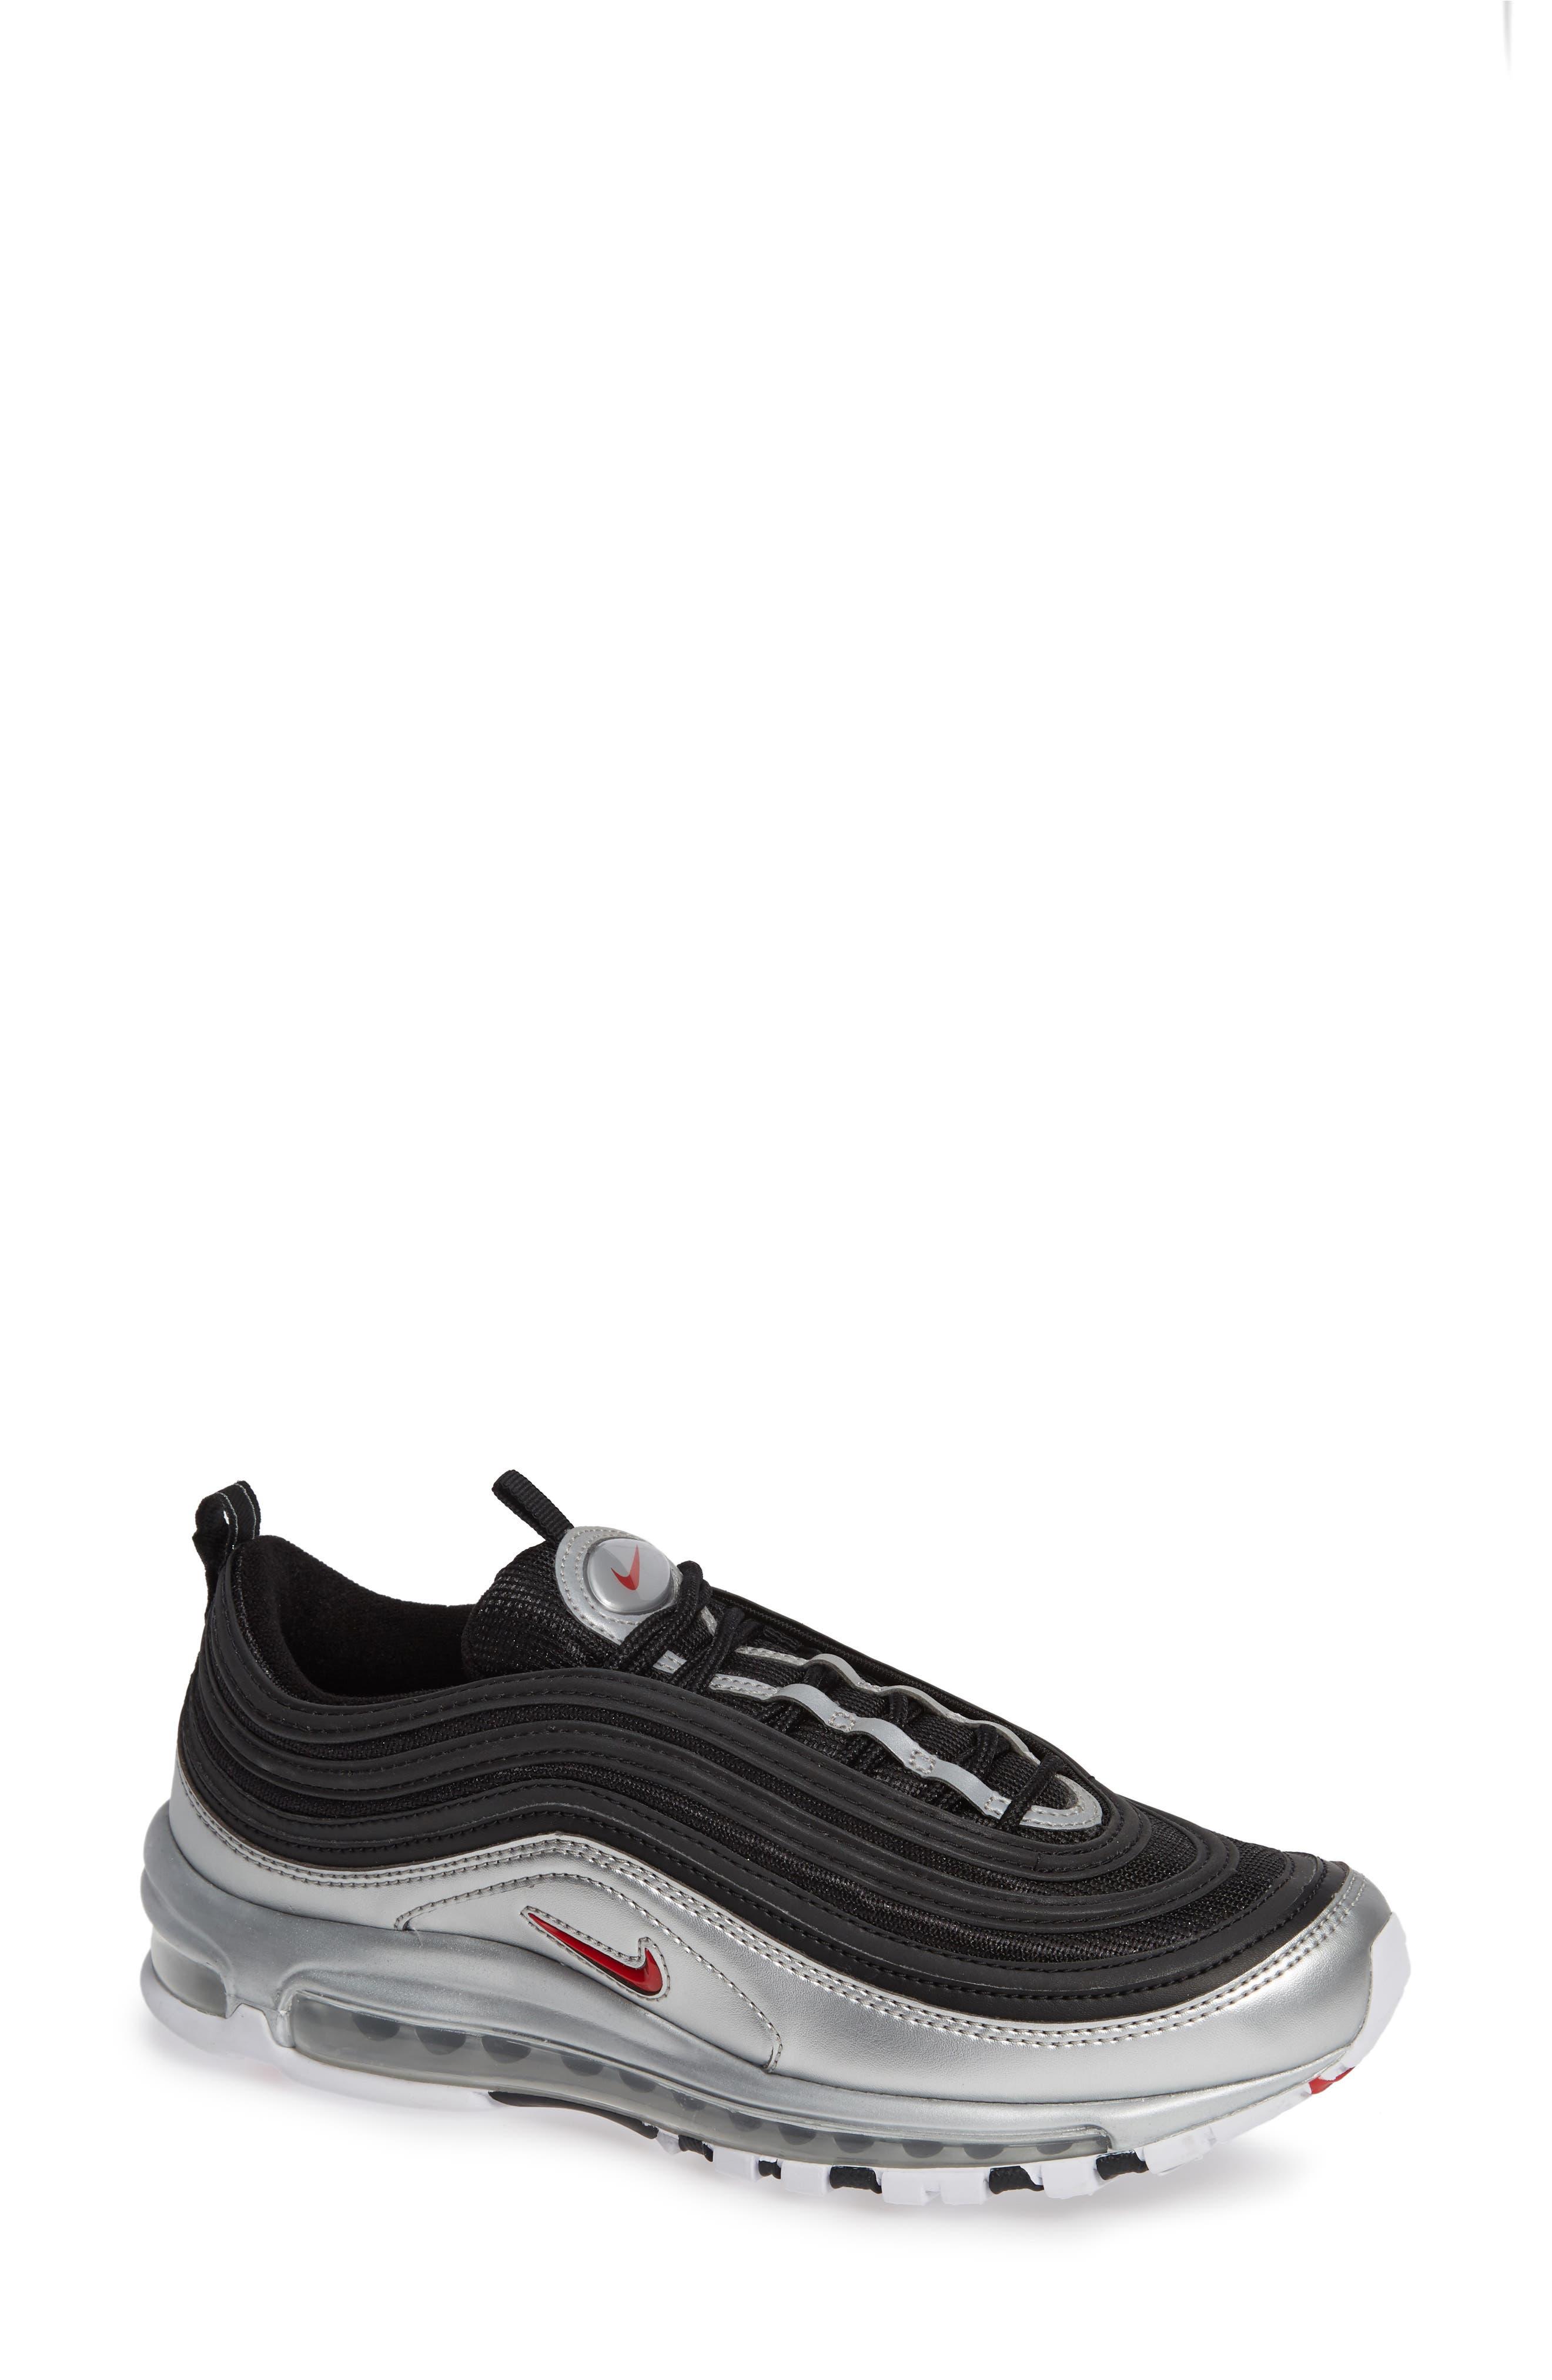 Air Max 97 QS Sneaker,                         Main,                         color, BLACK/ VARSITY RED/ SILVER